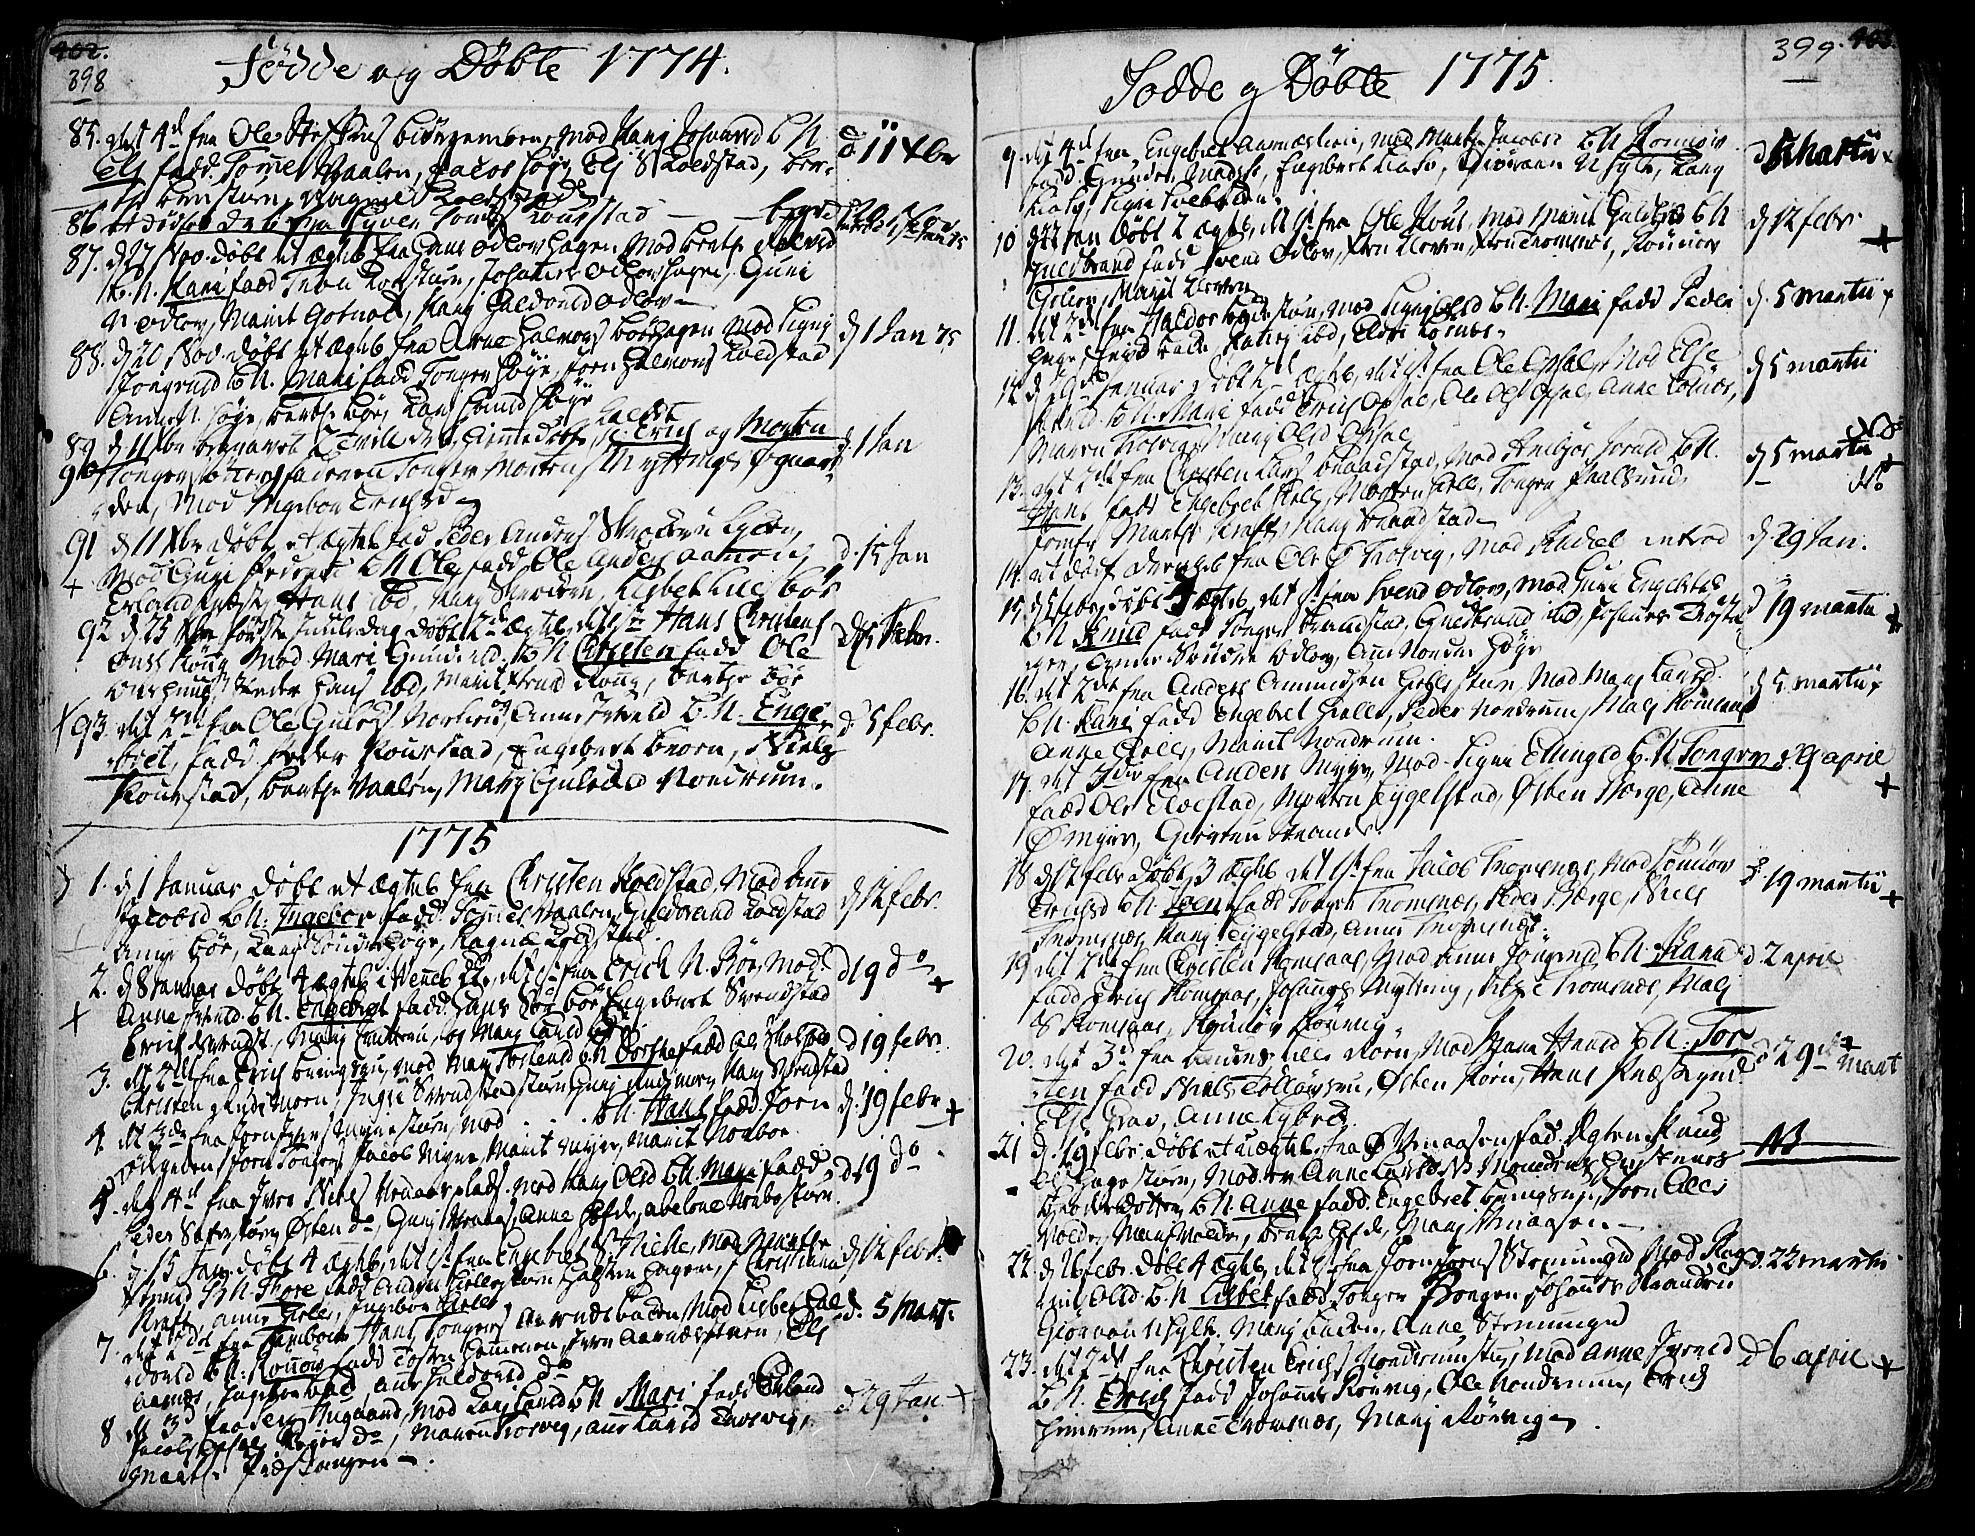 SAH, Ringebu prestekontor, Ministerialbok nr. 2, 1734-1780, s. 398-399